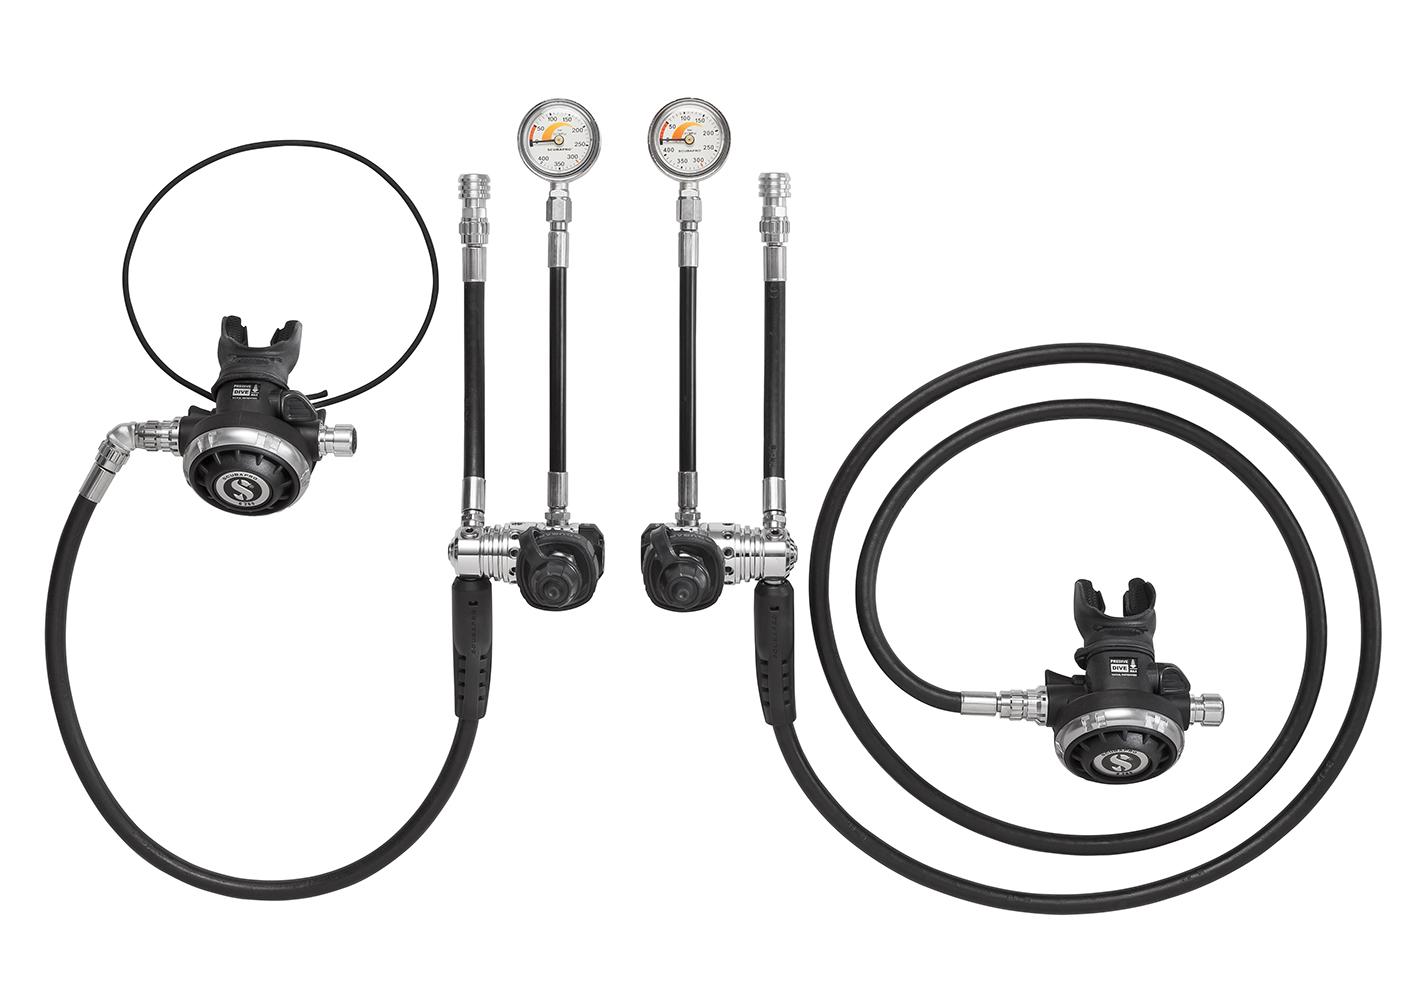 Комплект водолазни регулатори SIDEMOUNT Kit MK25 EVO / G260 - Scubapro